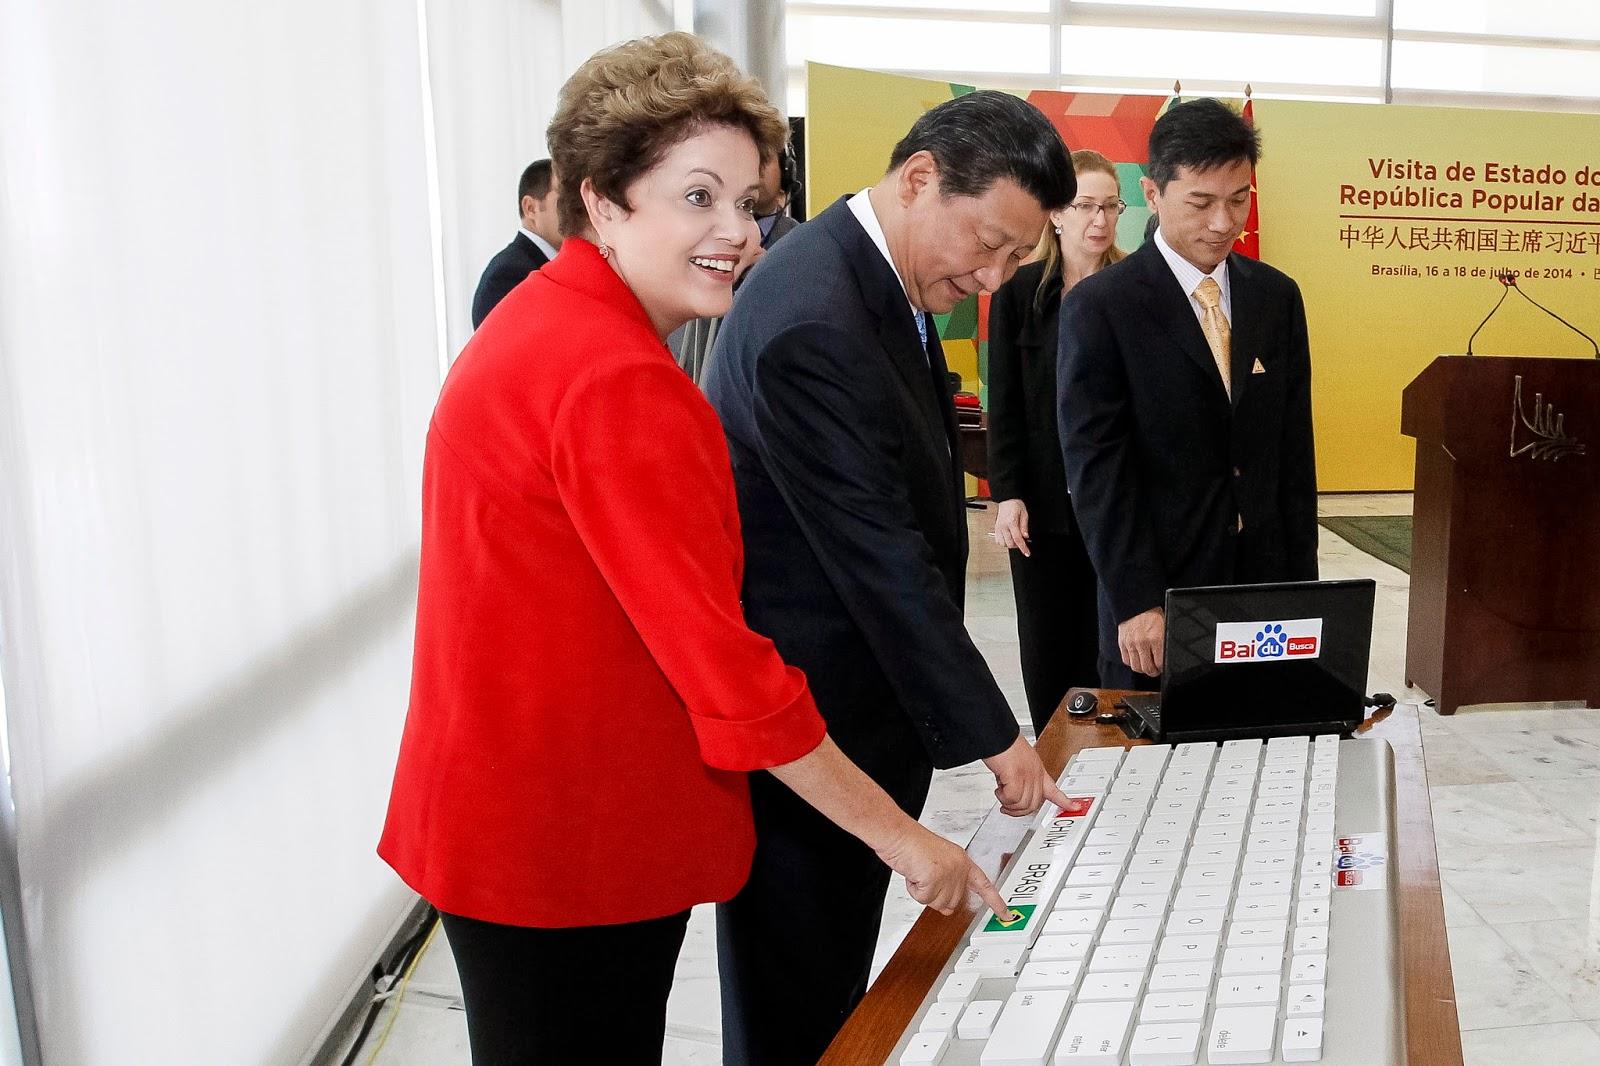 http://www.diariolasamericas.com/america-latina/china-y-rusia-rivalizan-estados-unidos-latinoamerica.html?dla=